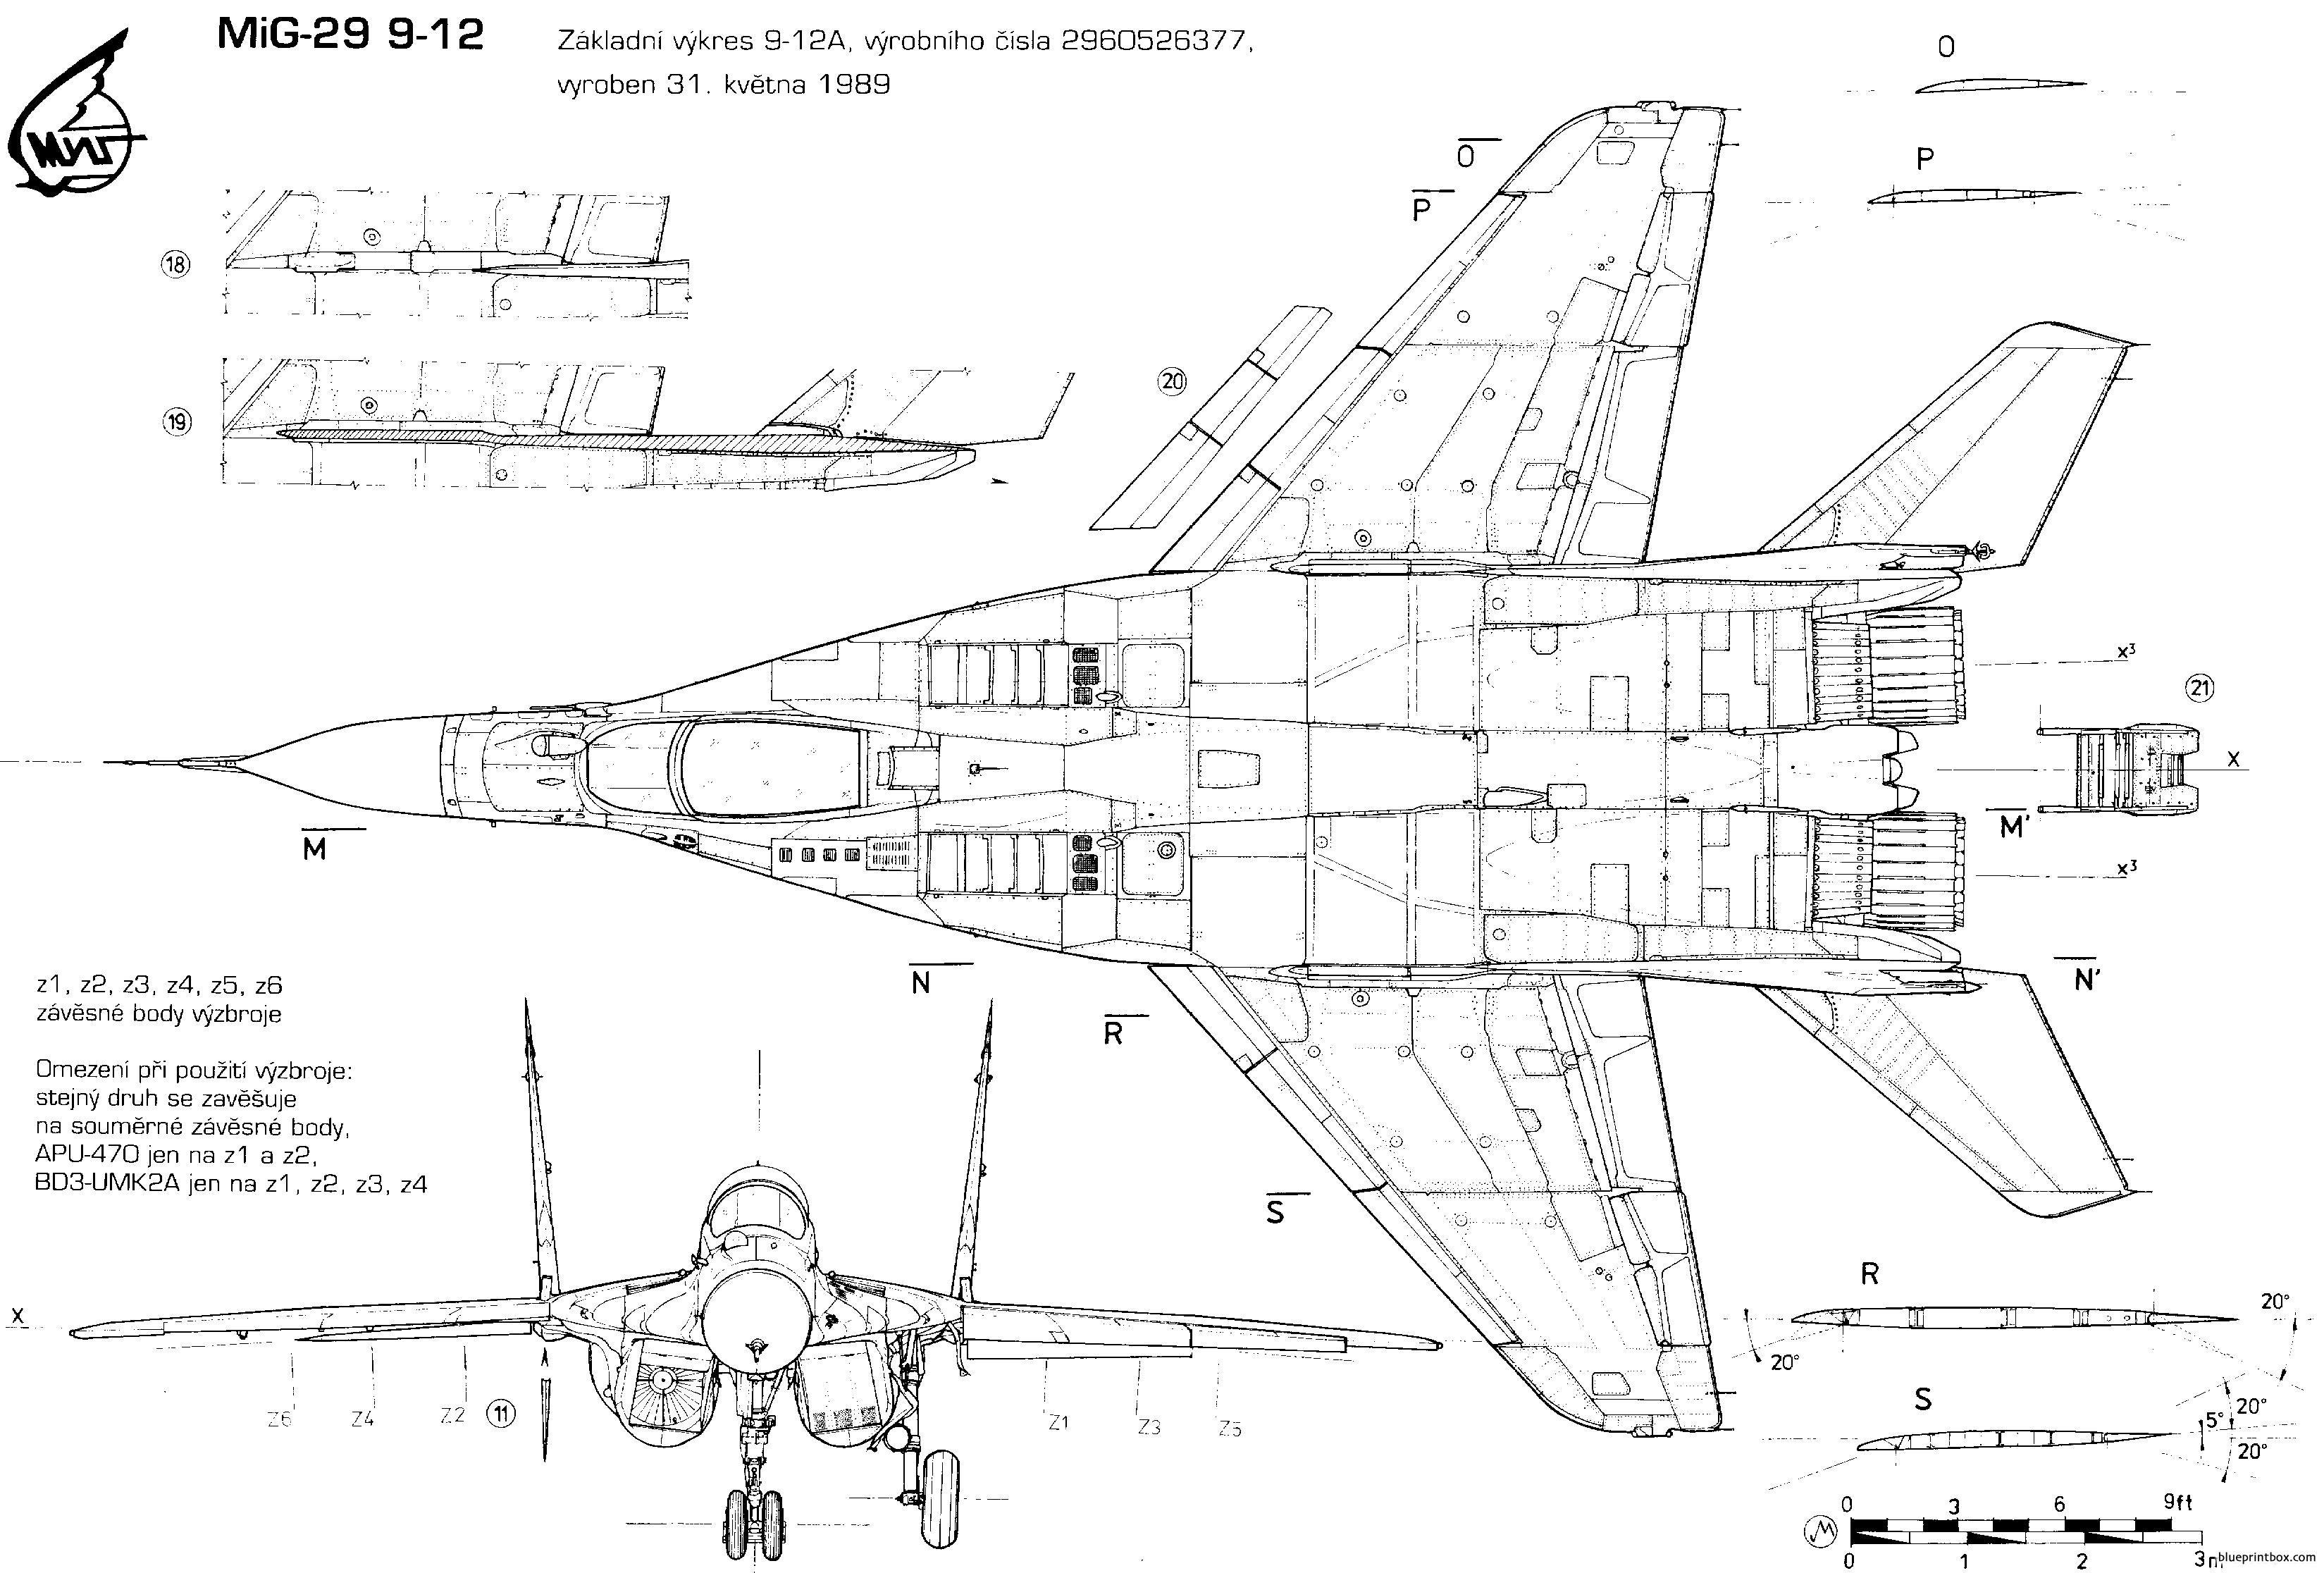 Dassault Mirage 2000 blueprint samoloty t Aircraft